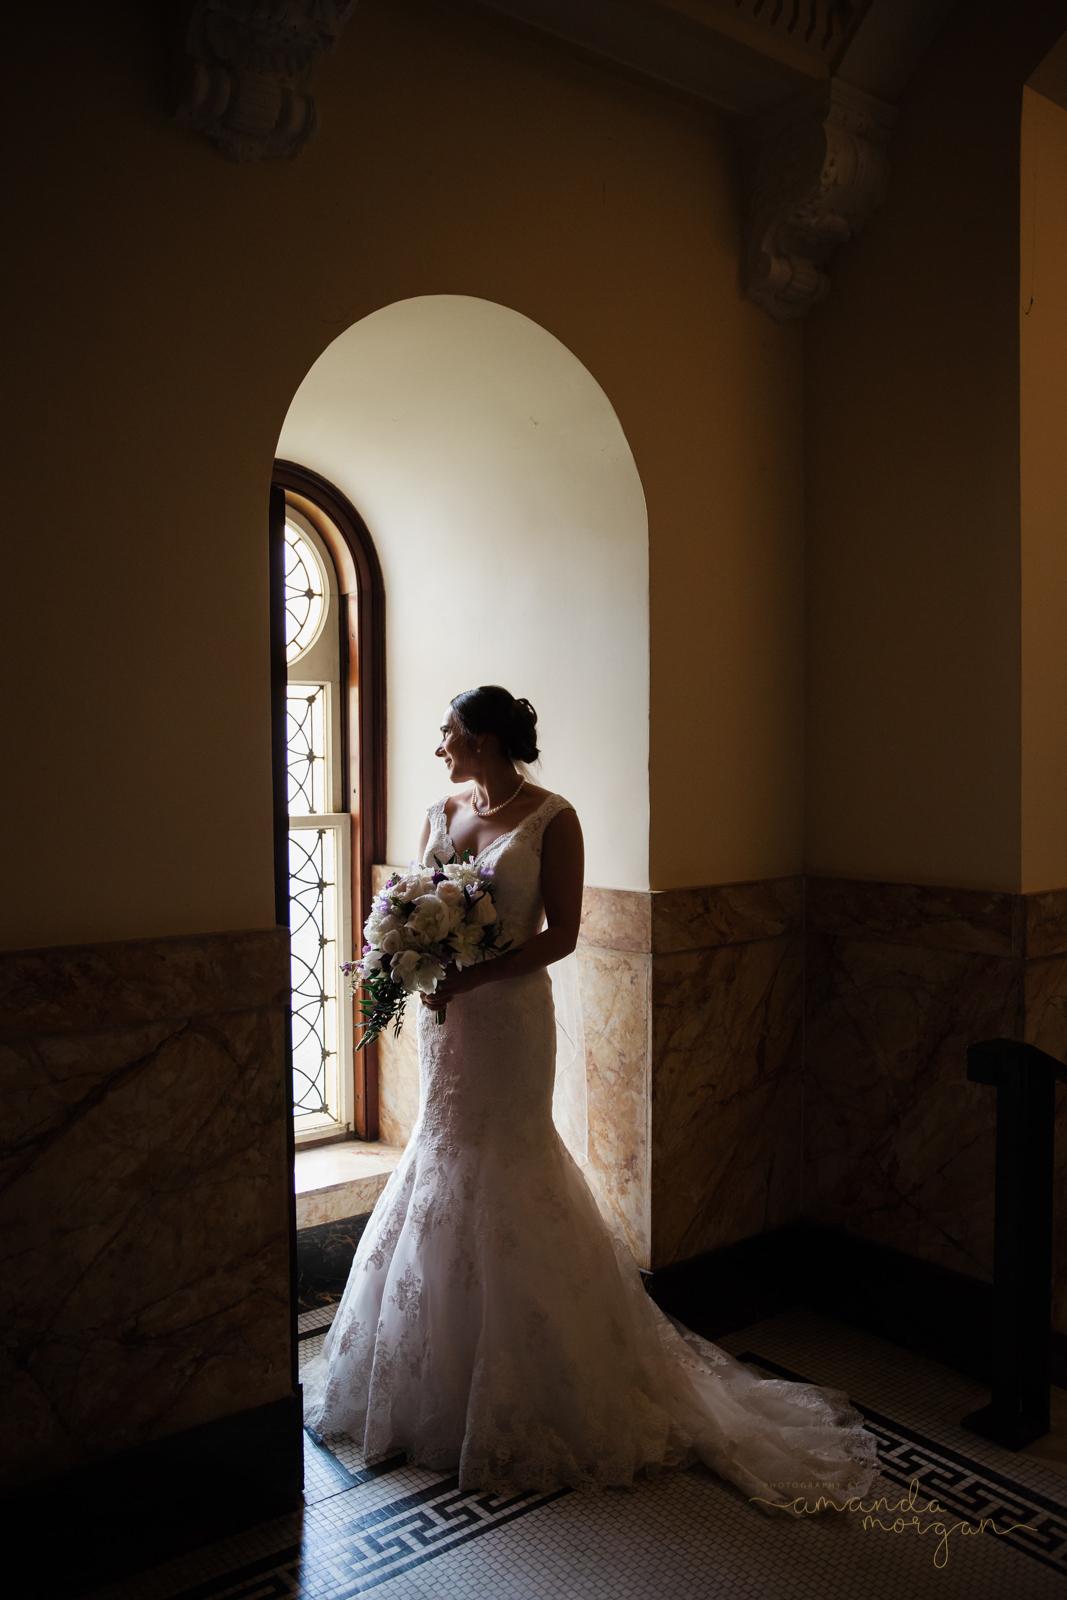 Notre-Dame-Catholic-Church-Wedding-Amanda-Morgan-12.jpg